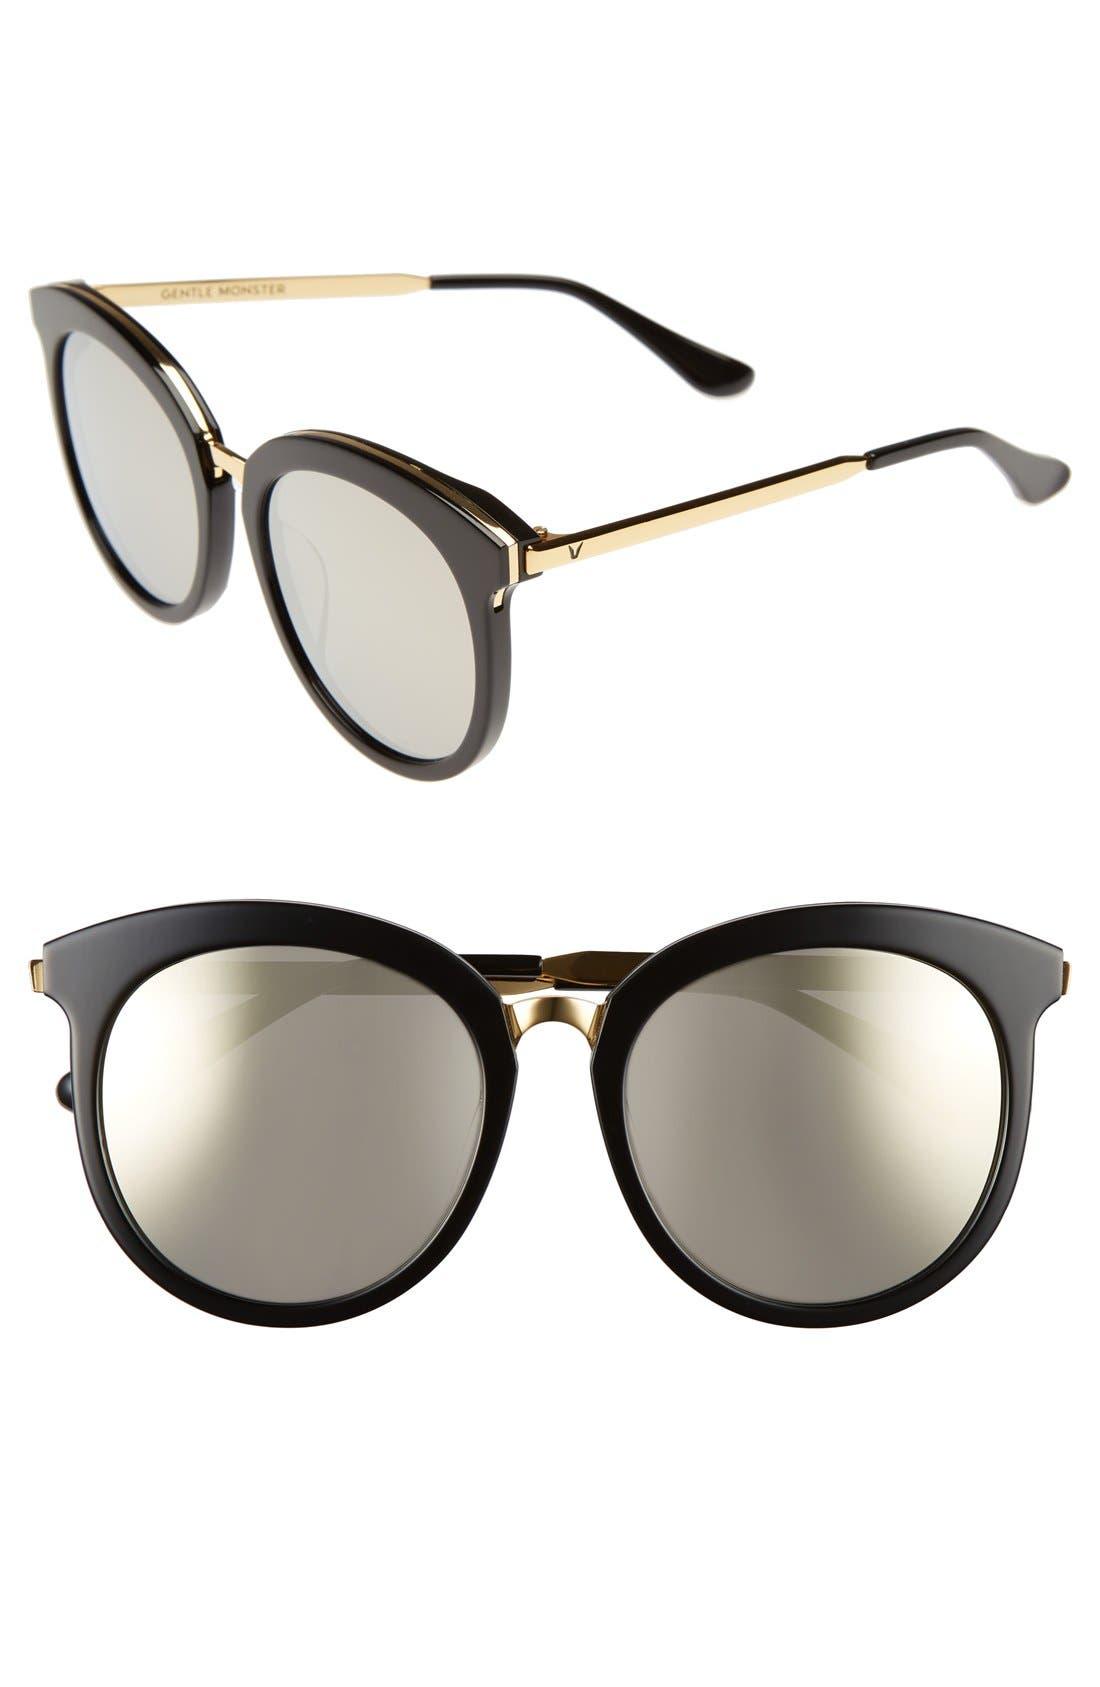 Main Image - Gentle Monster 56mm Round Sunglasses